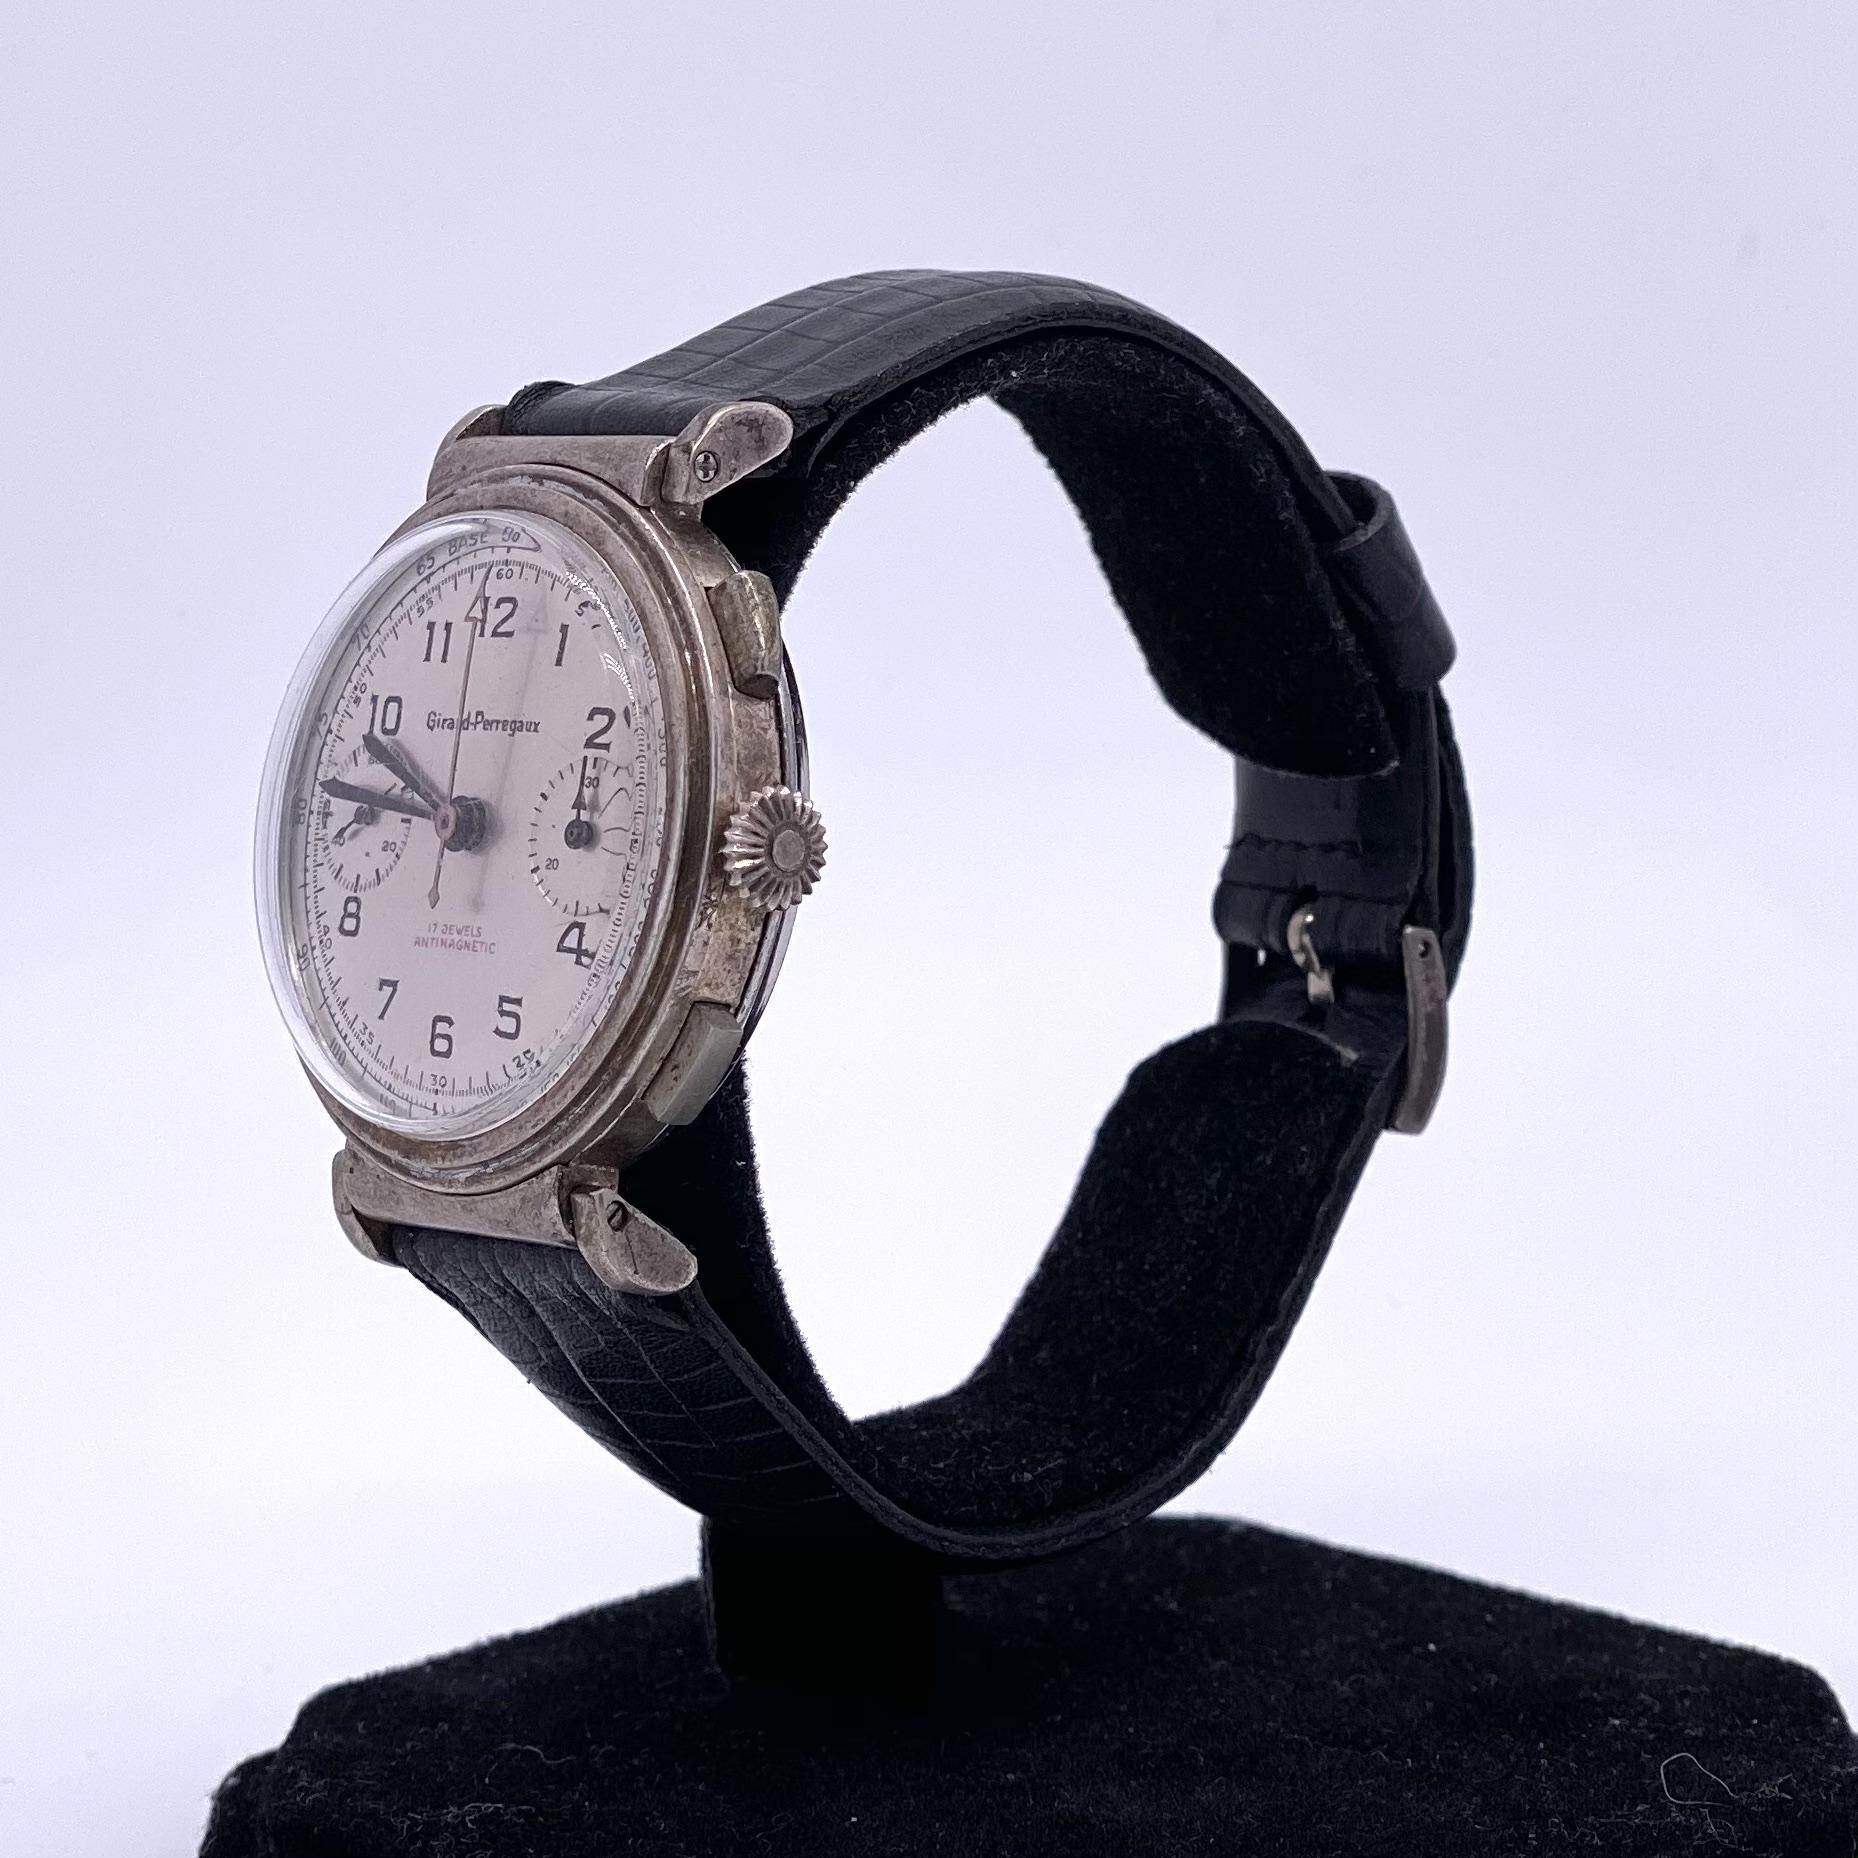 Girard Perregaux Vintage Chronograph - Image 2 of 4